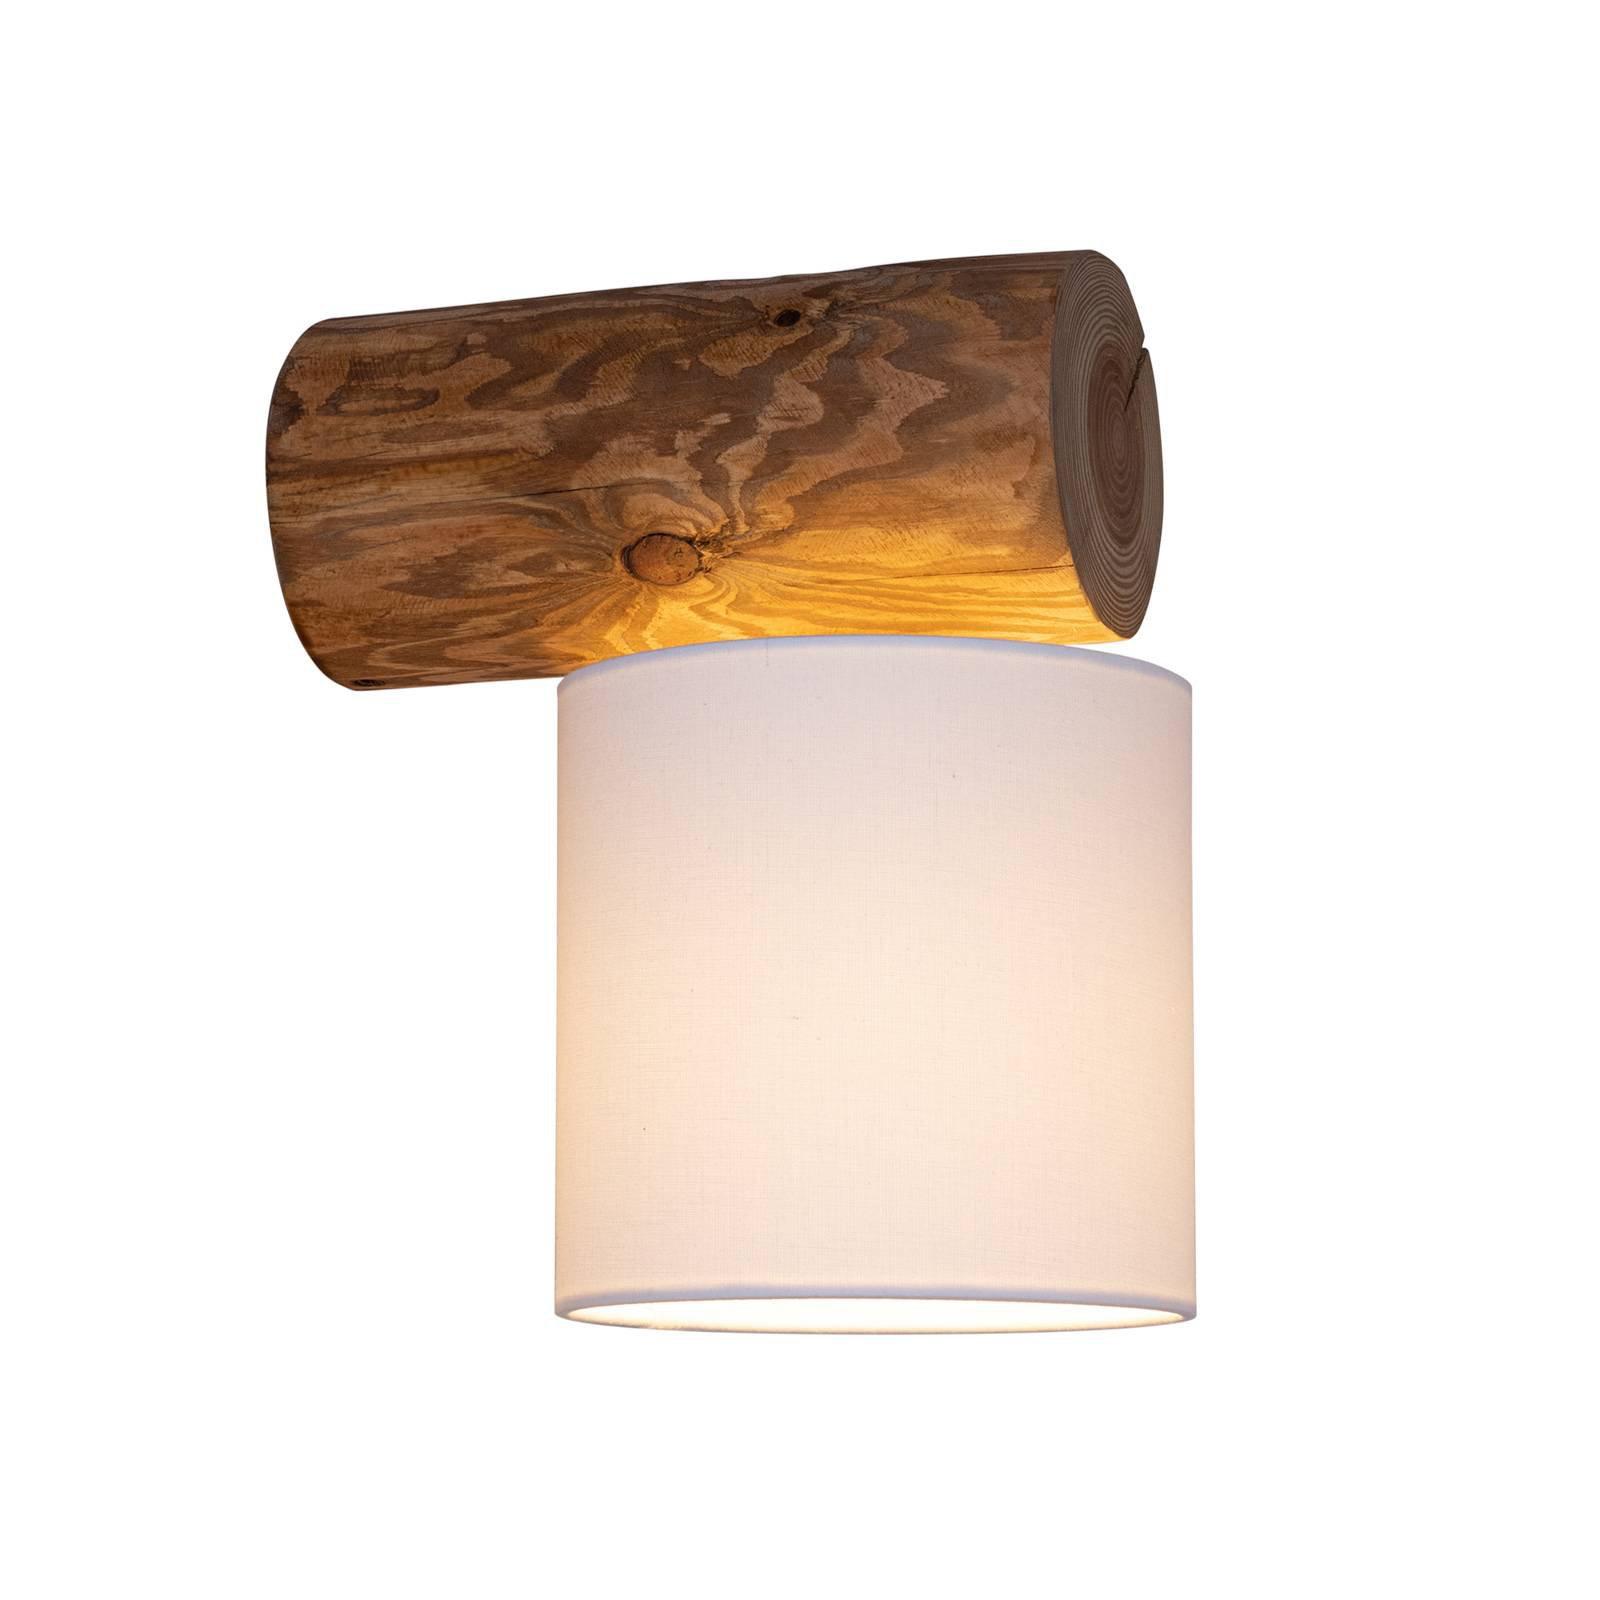 Vegglampe Pino Simple, skjerm hvit, stamme brun